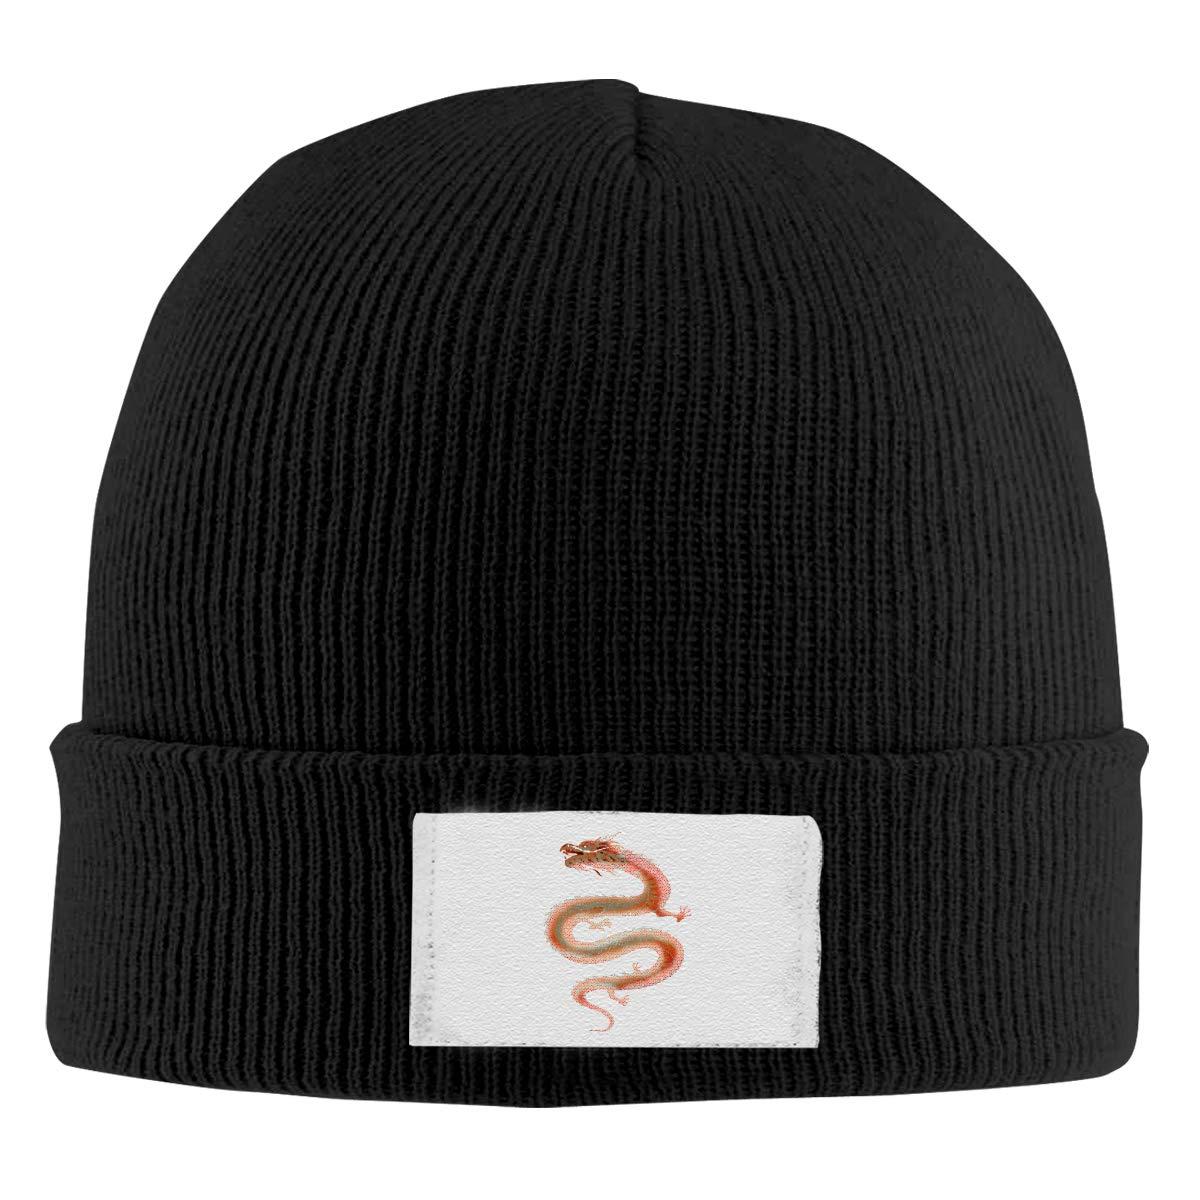 Skull Caps Dragon Winter Warm Knit Hats Stretchy Cuff Beanie Hat Black